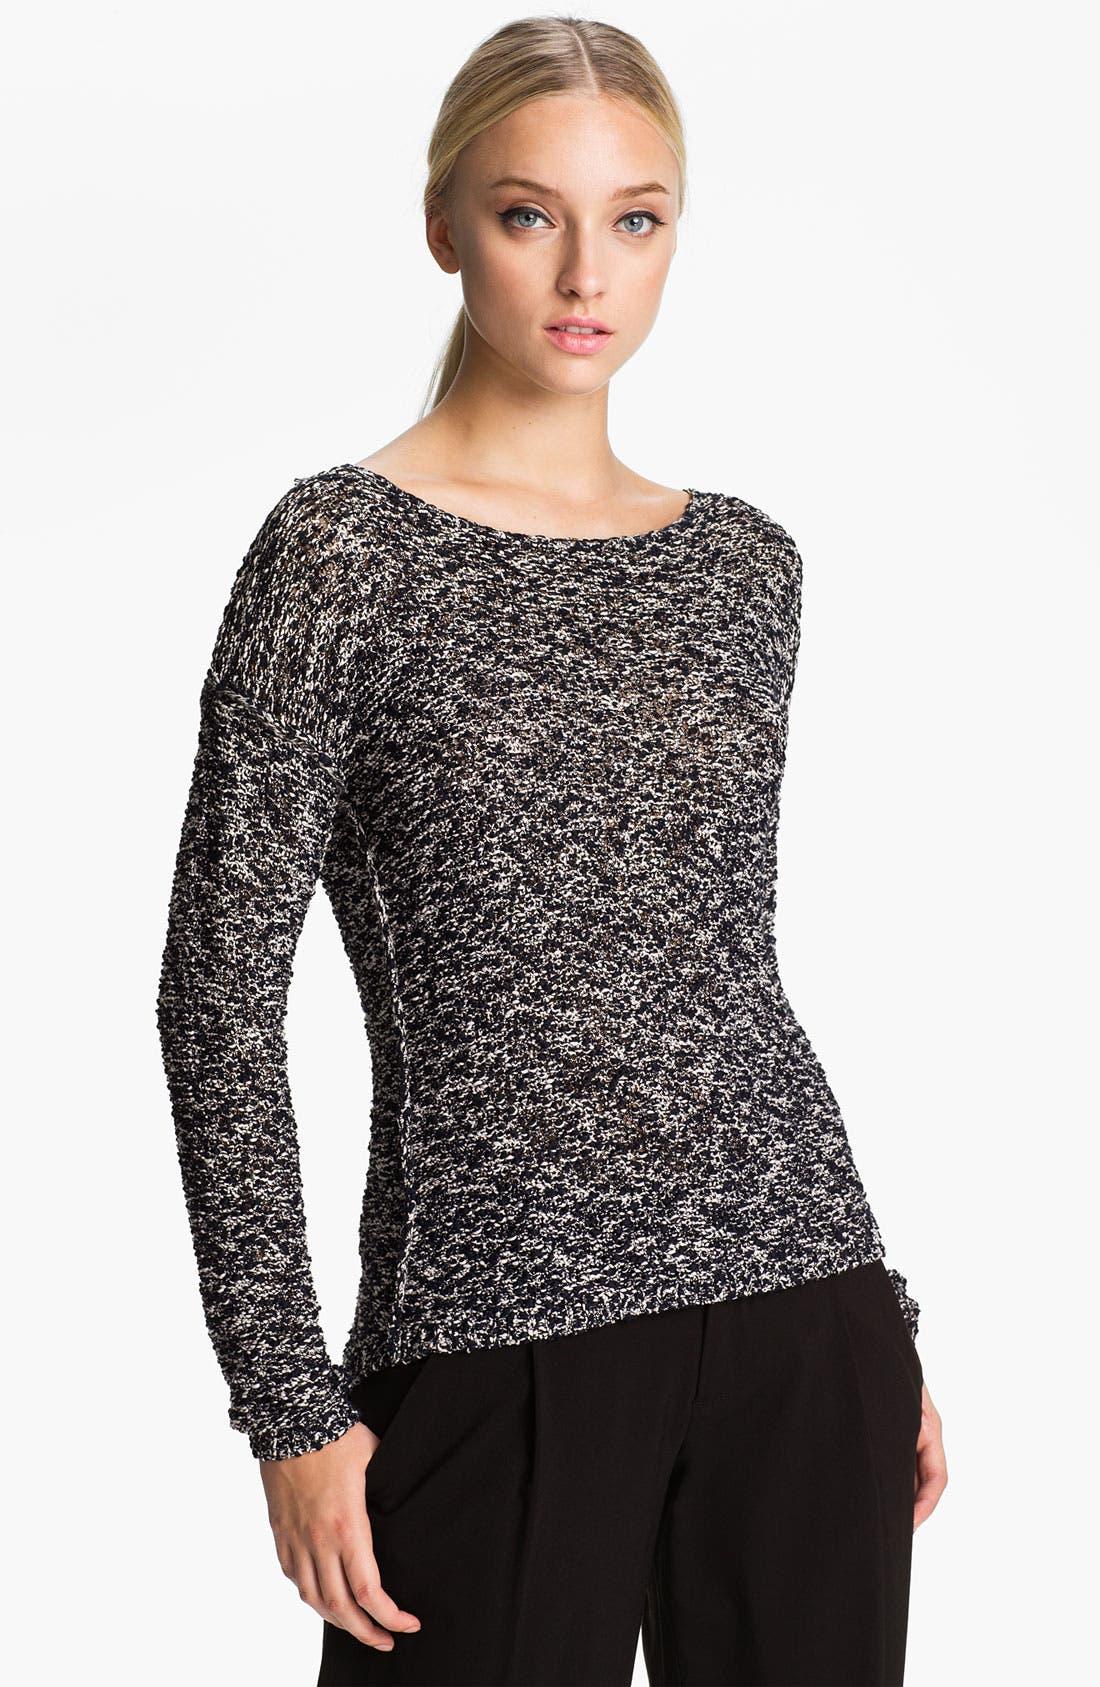 Alternate Image 1 Selected - Alice + Olivia 'Gloria' Boxy Knit Sweater